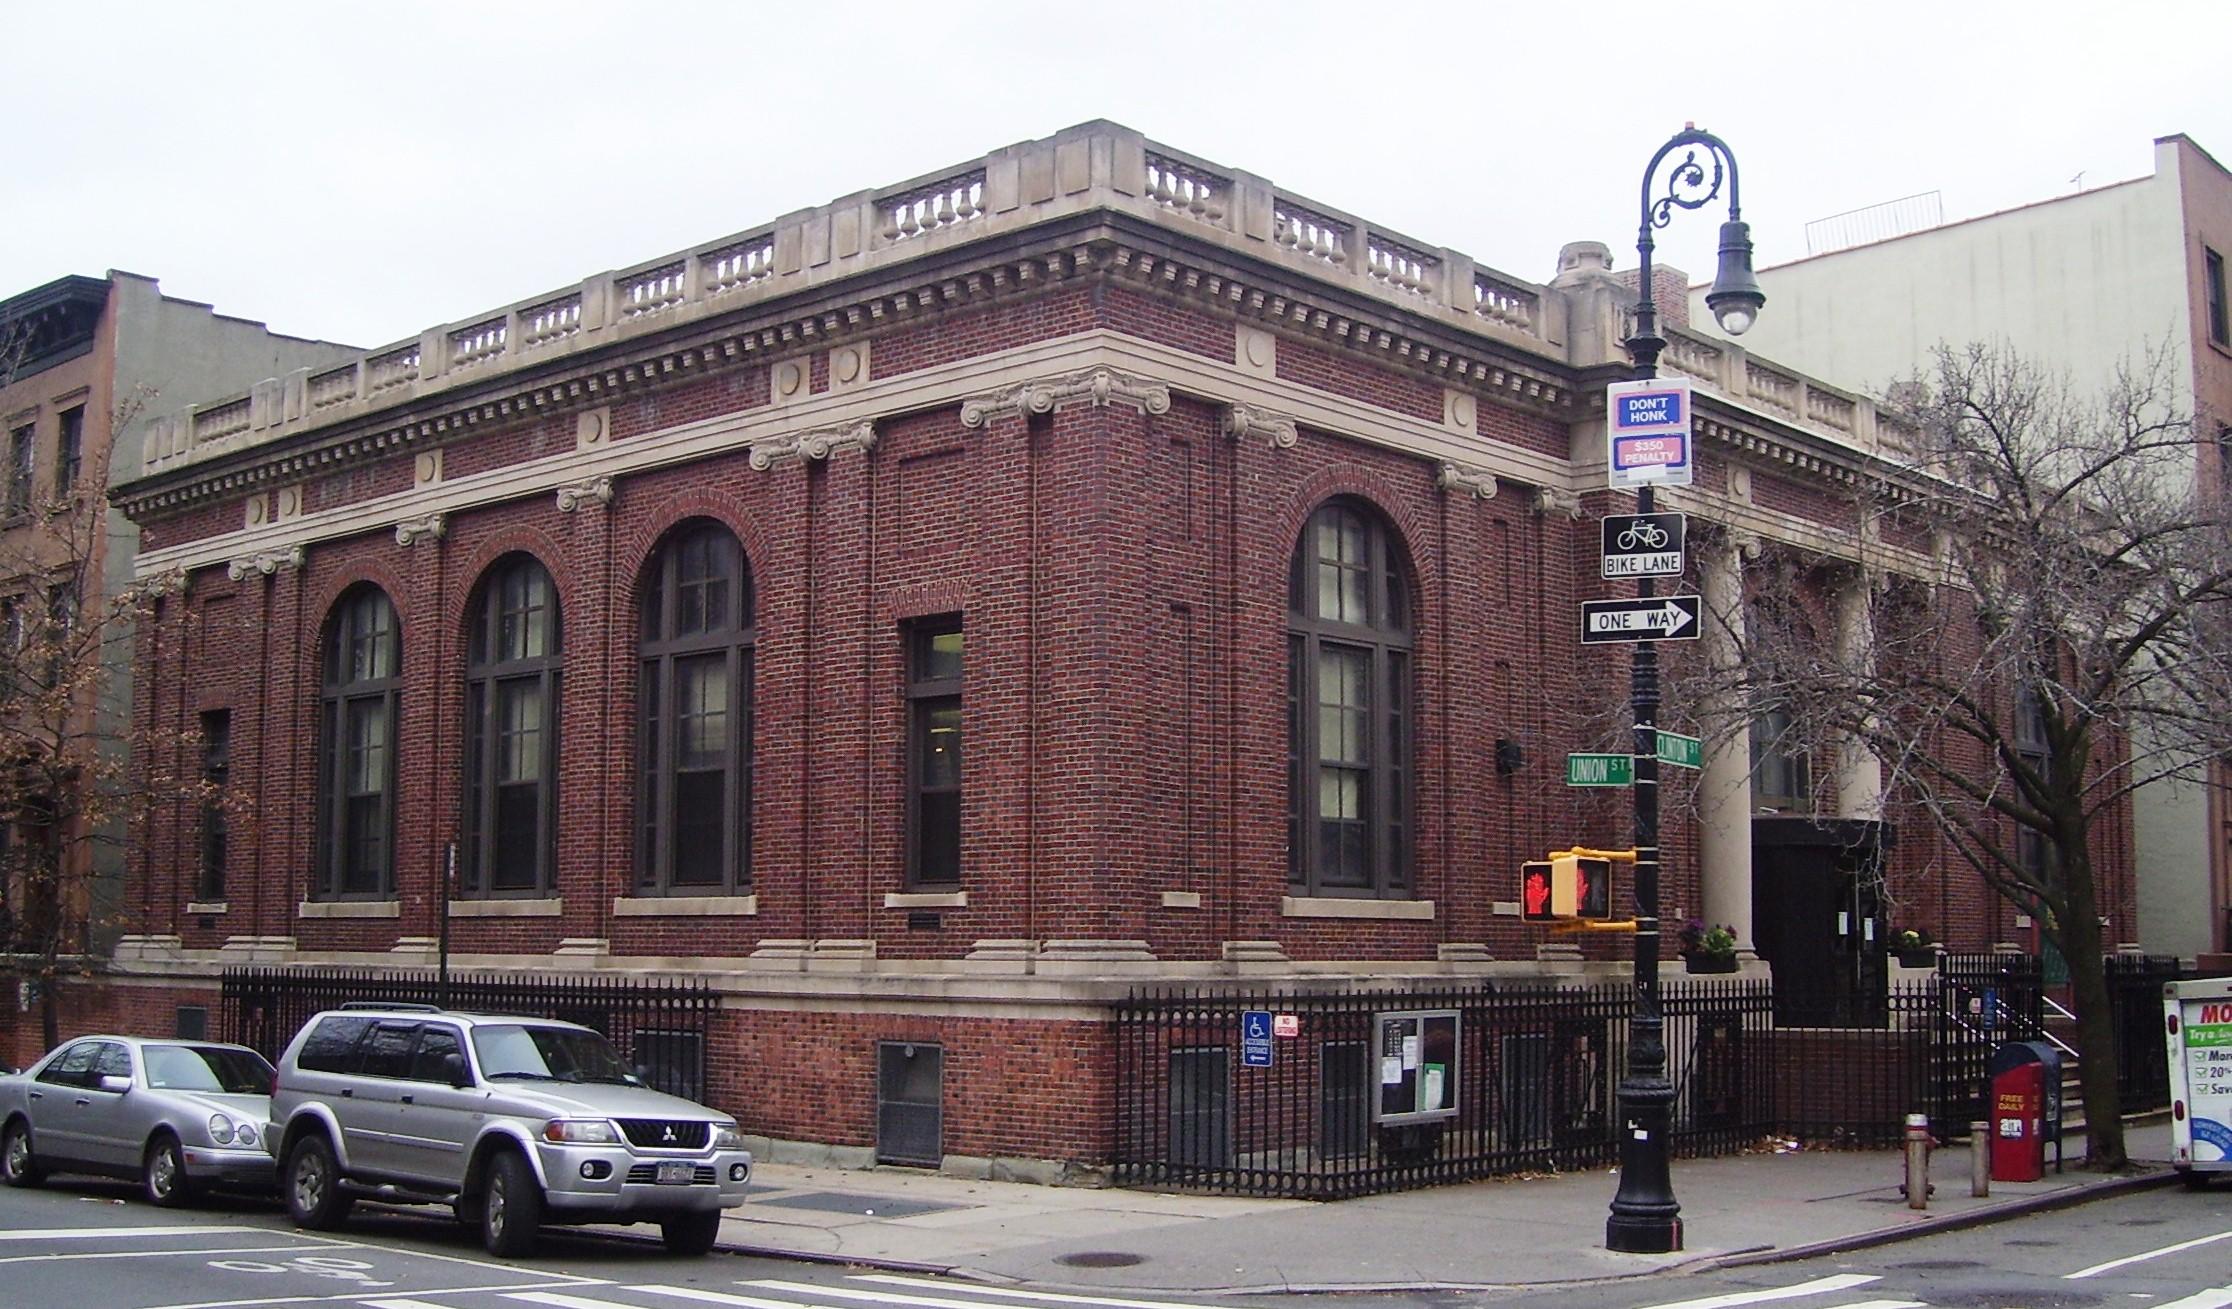 FileCarroll Gardens Branch Brooklyn Public Libraryjpg